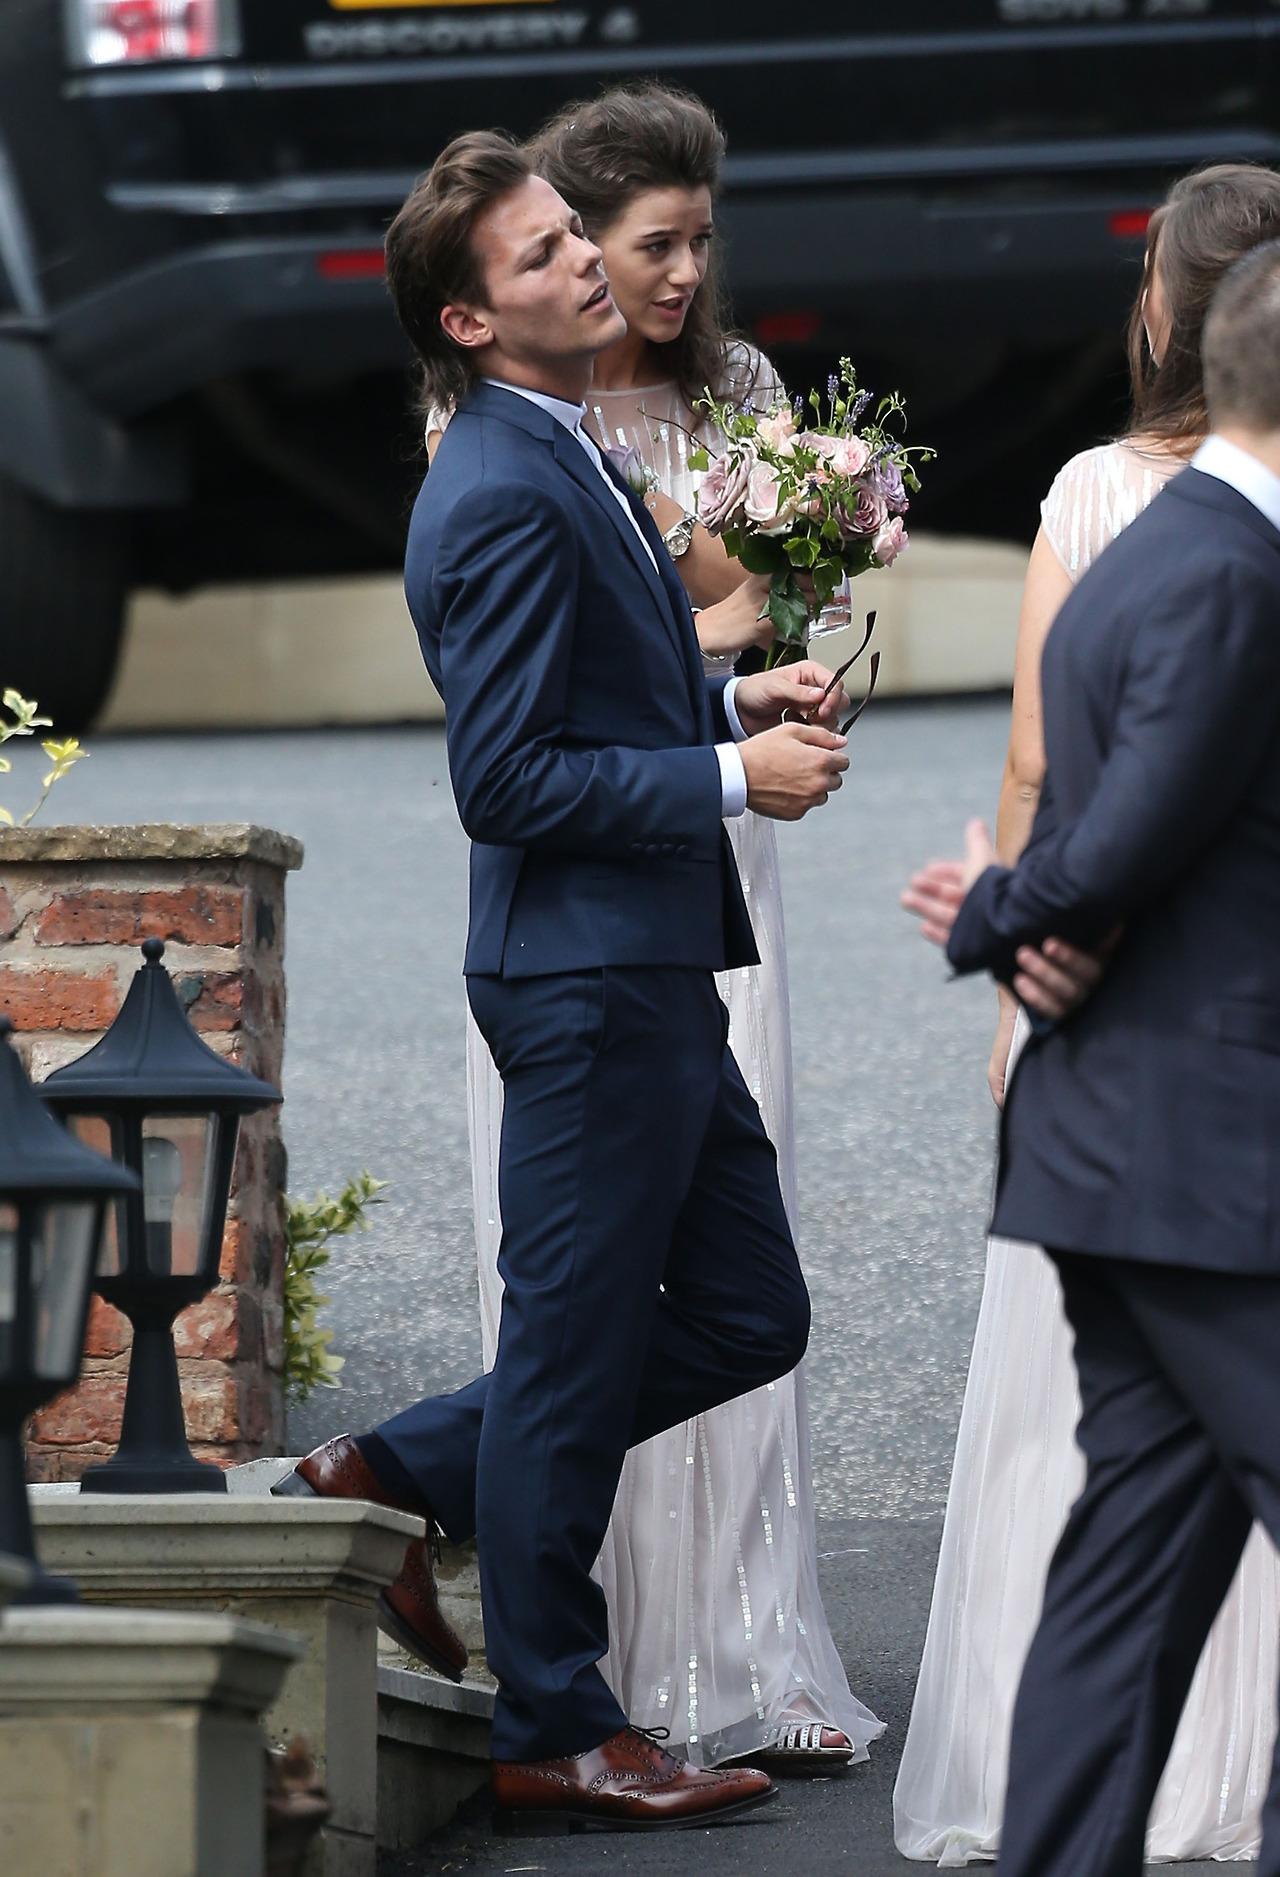 Louis and Eleanor at Johannah and Dan's wedding. 20/07/14